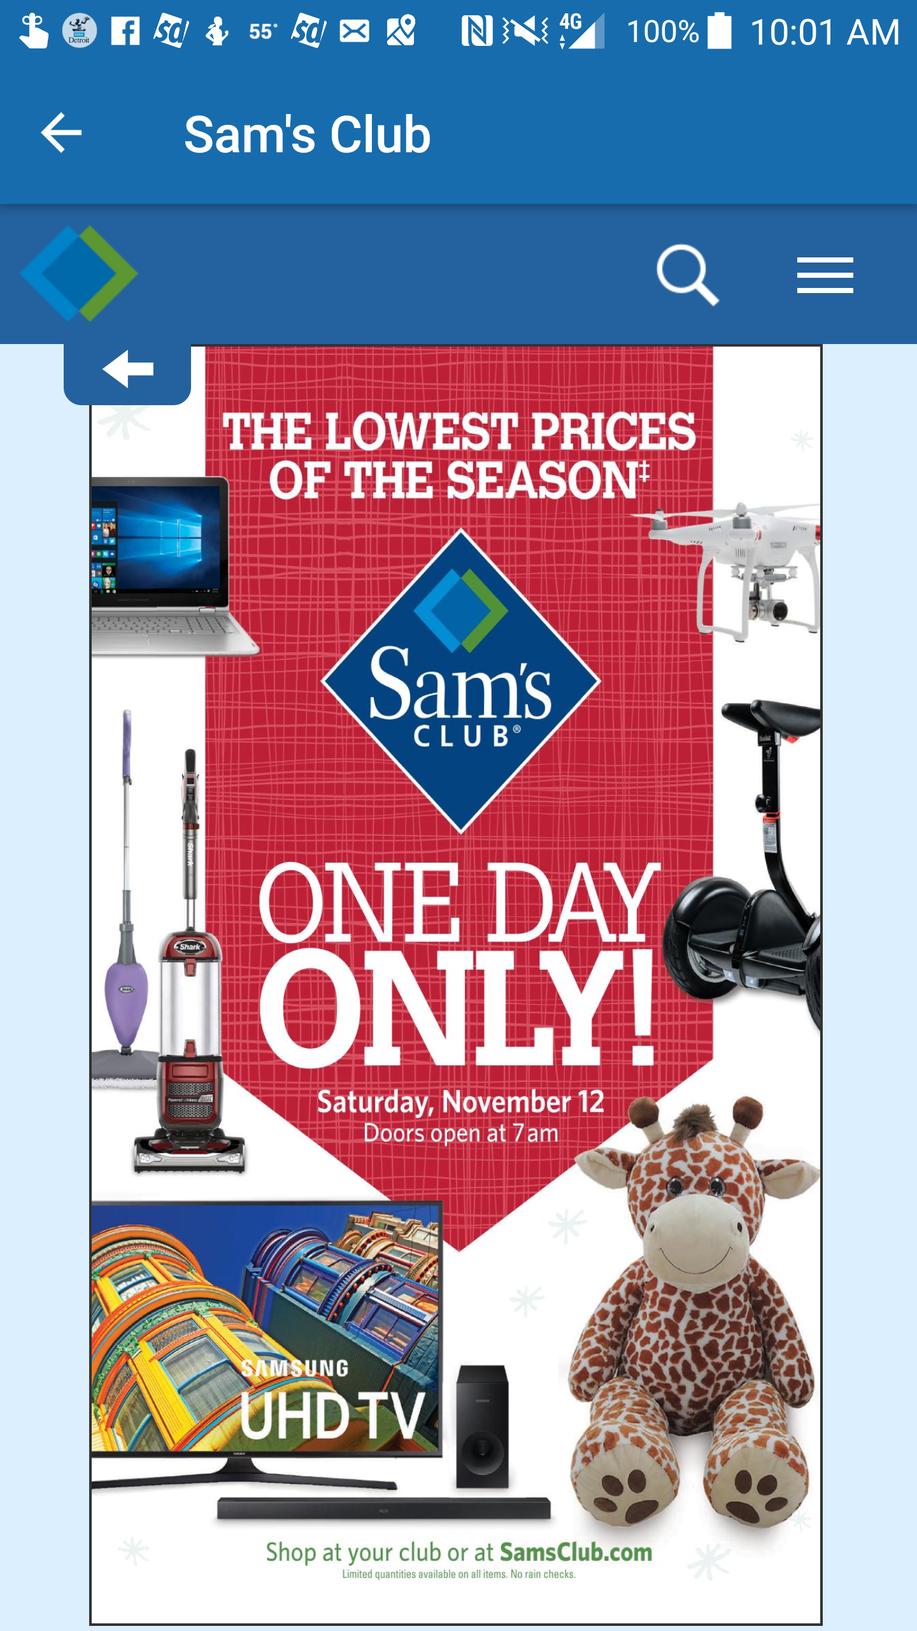 iPhone / Samsung $250 Sam's club gift card - Nov 12th B&M